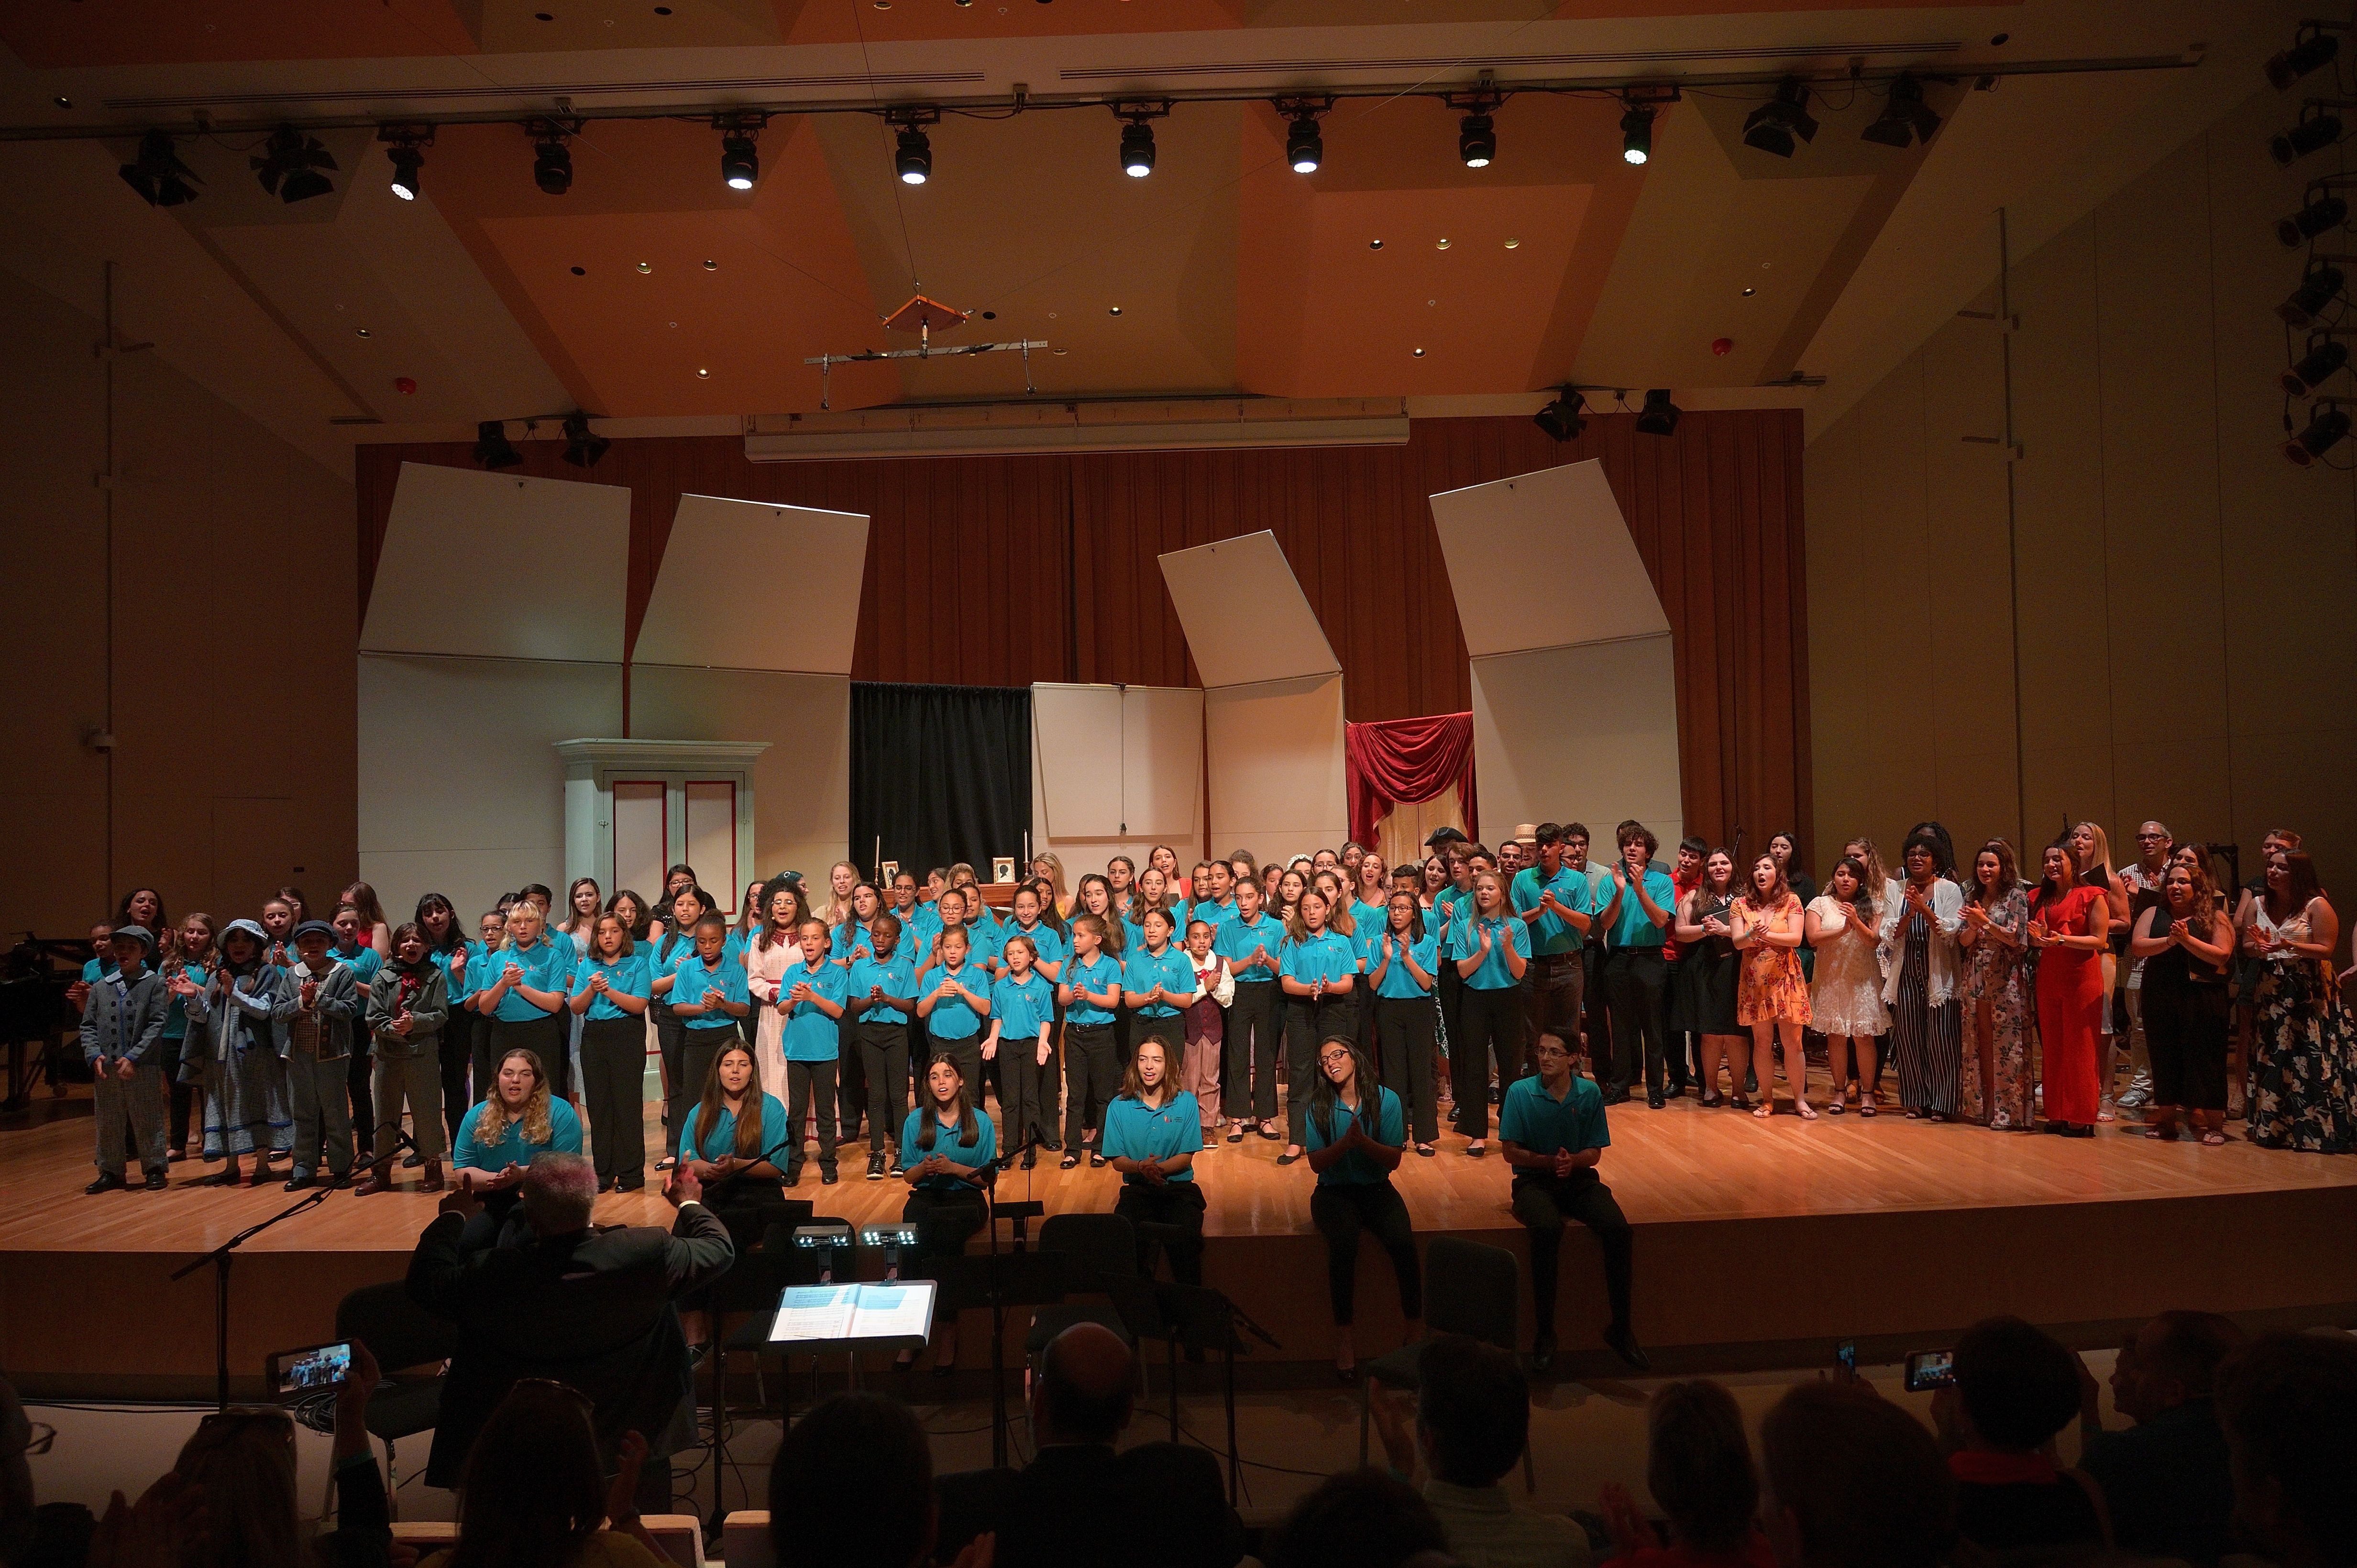 MCC Alumni + Choristers singing Give us Hope